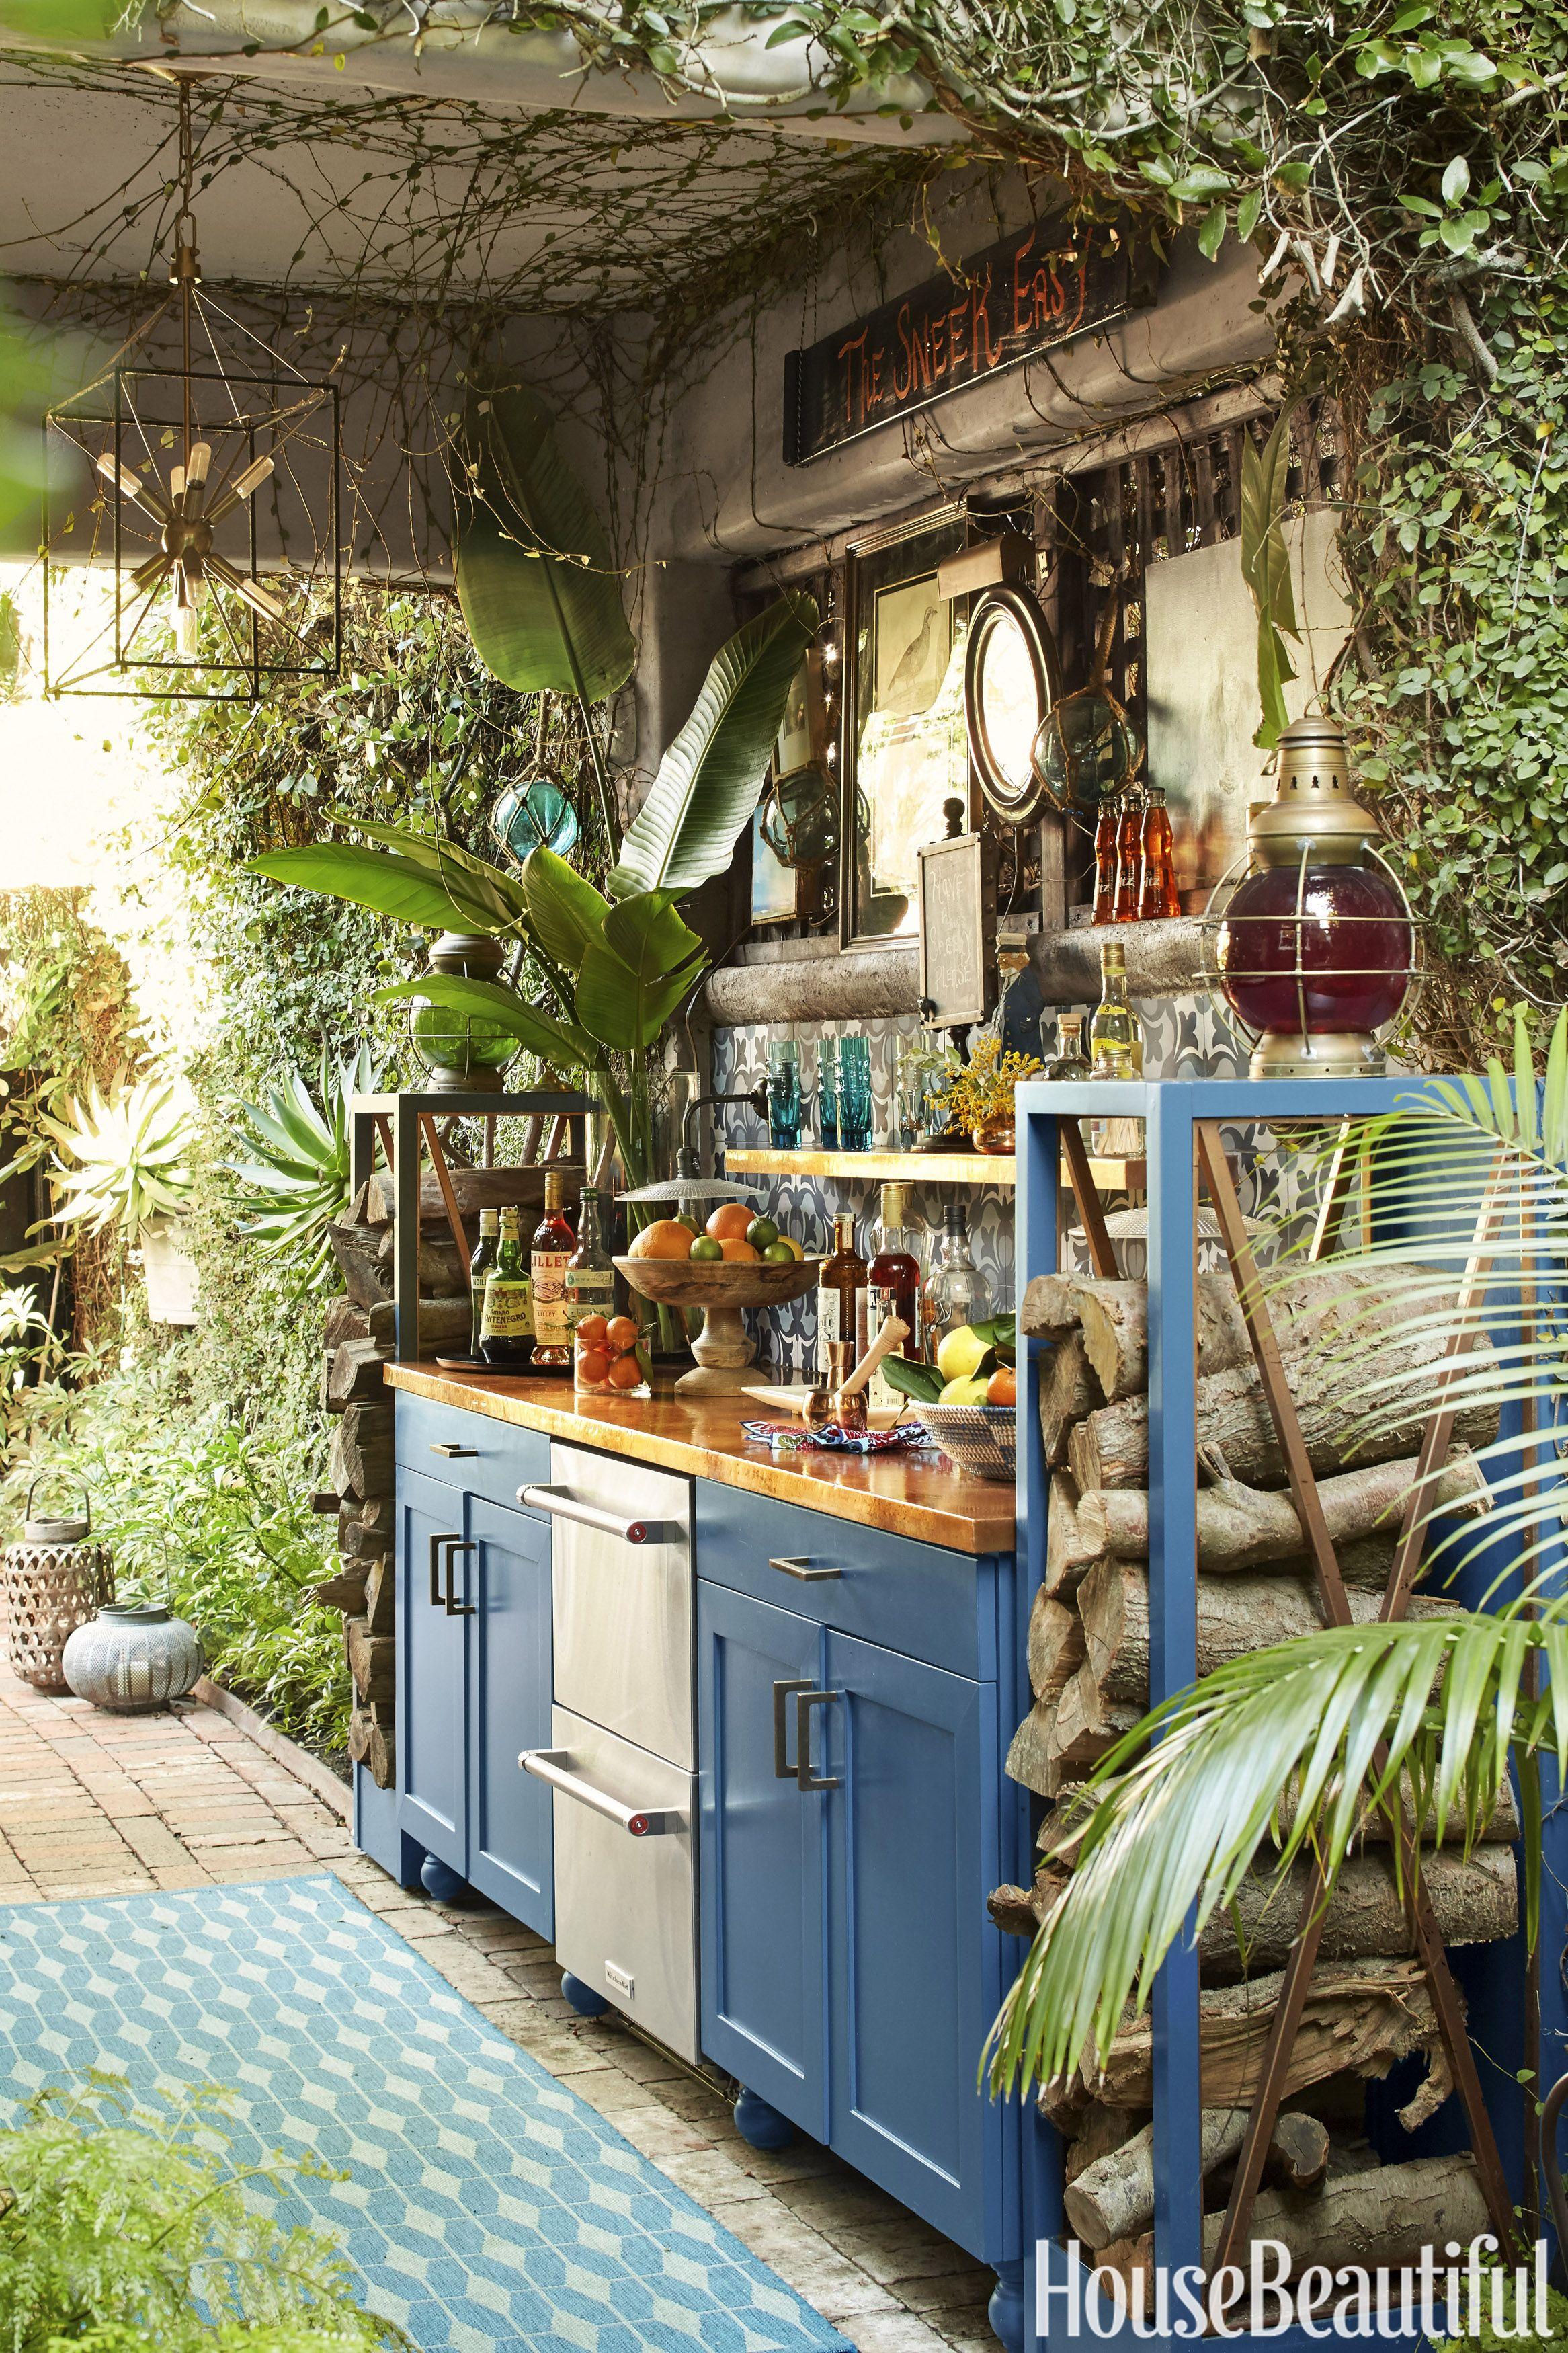 14 Outdoor Kitchen Design Ideas And Pictures Al Fresco Kitchen Styles